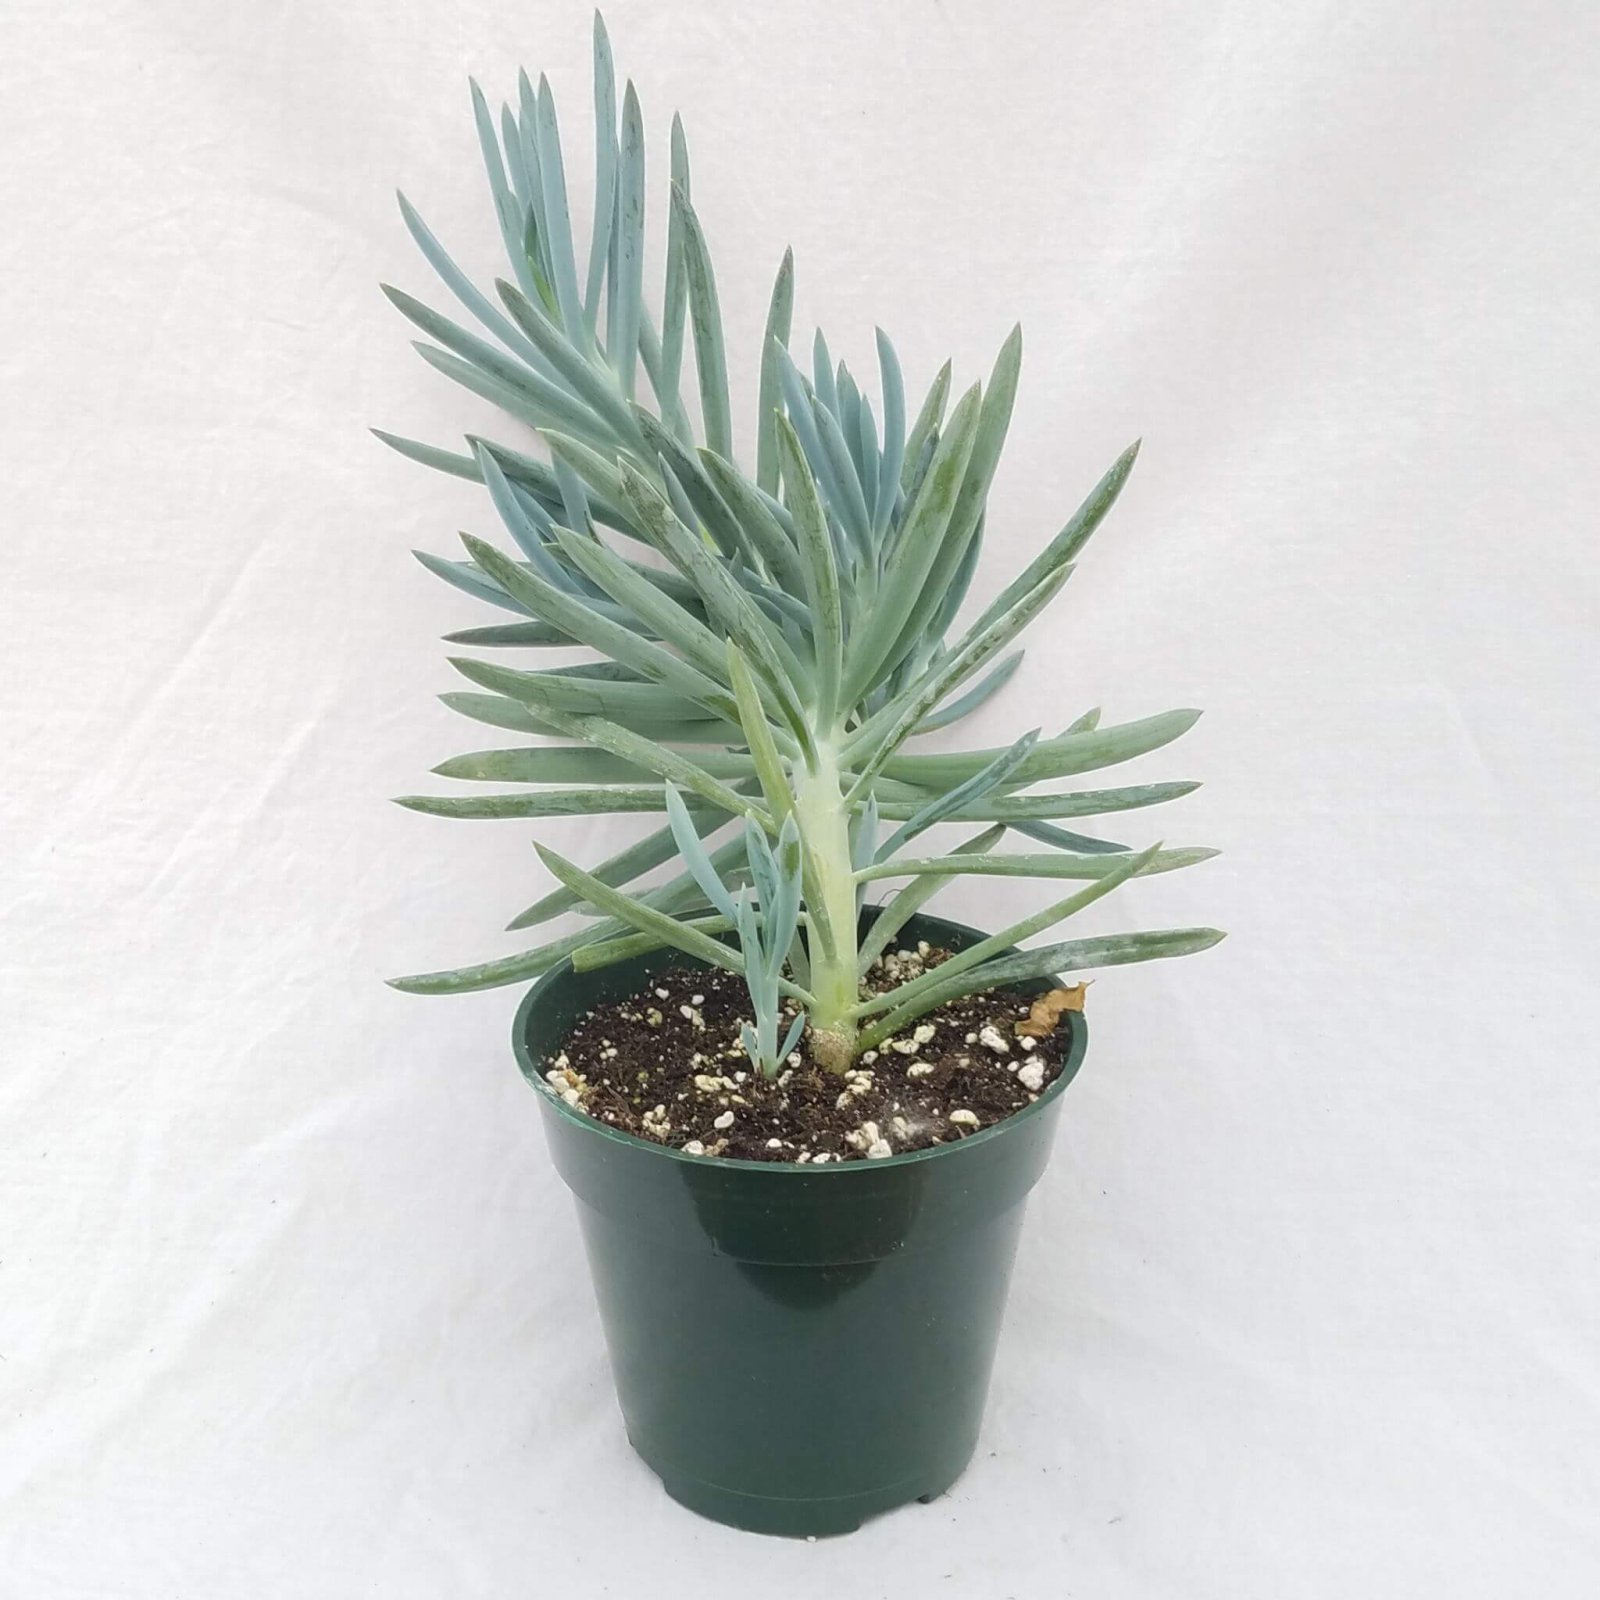 Senecio talinoides mandralis 'Blue' - 4 1/2